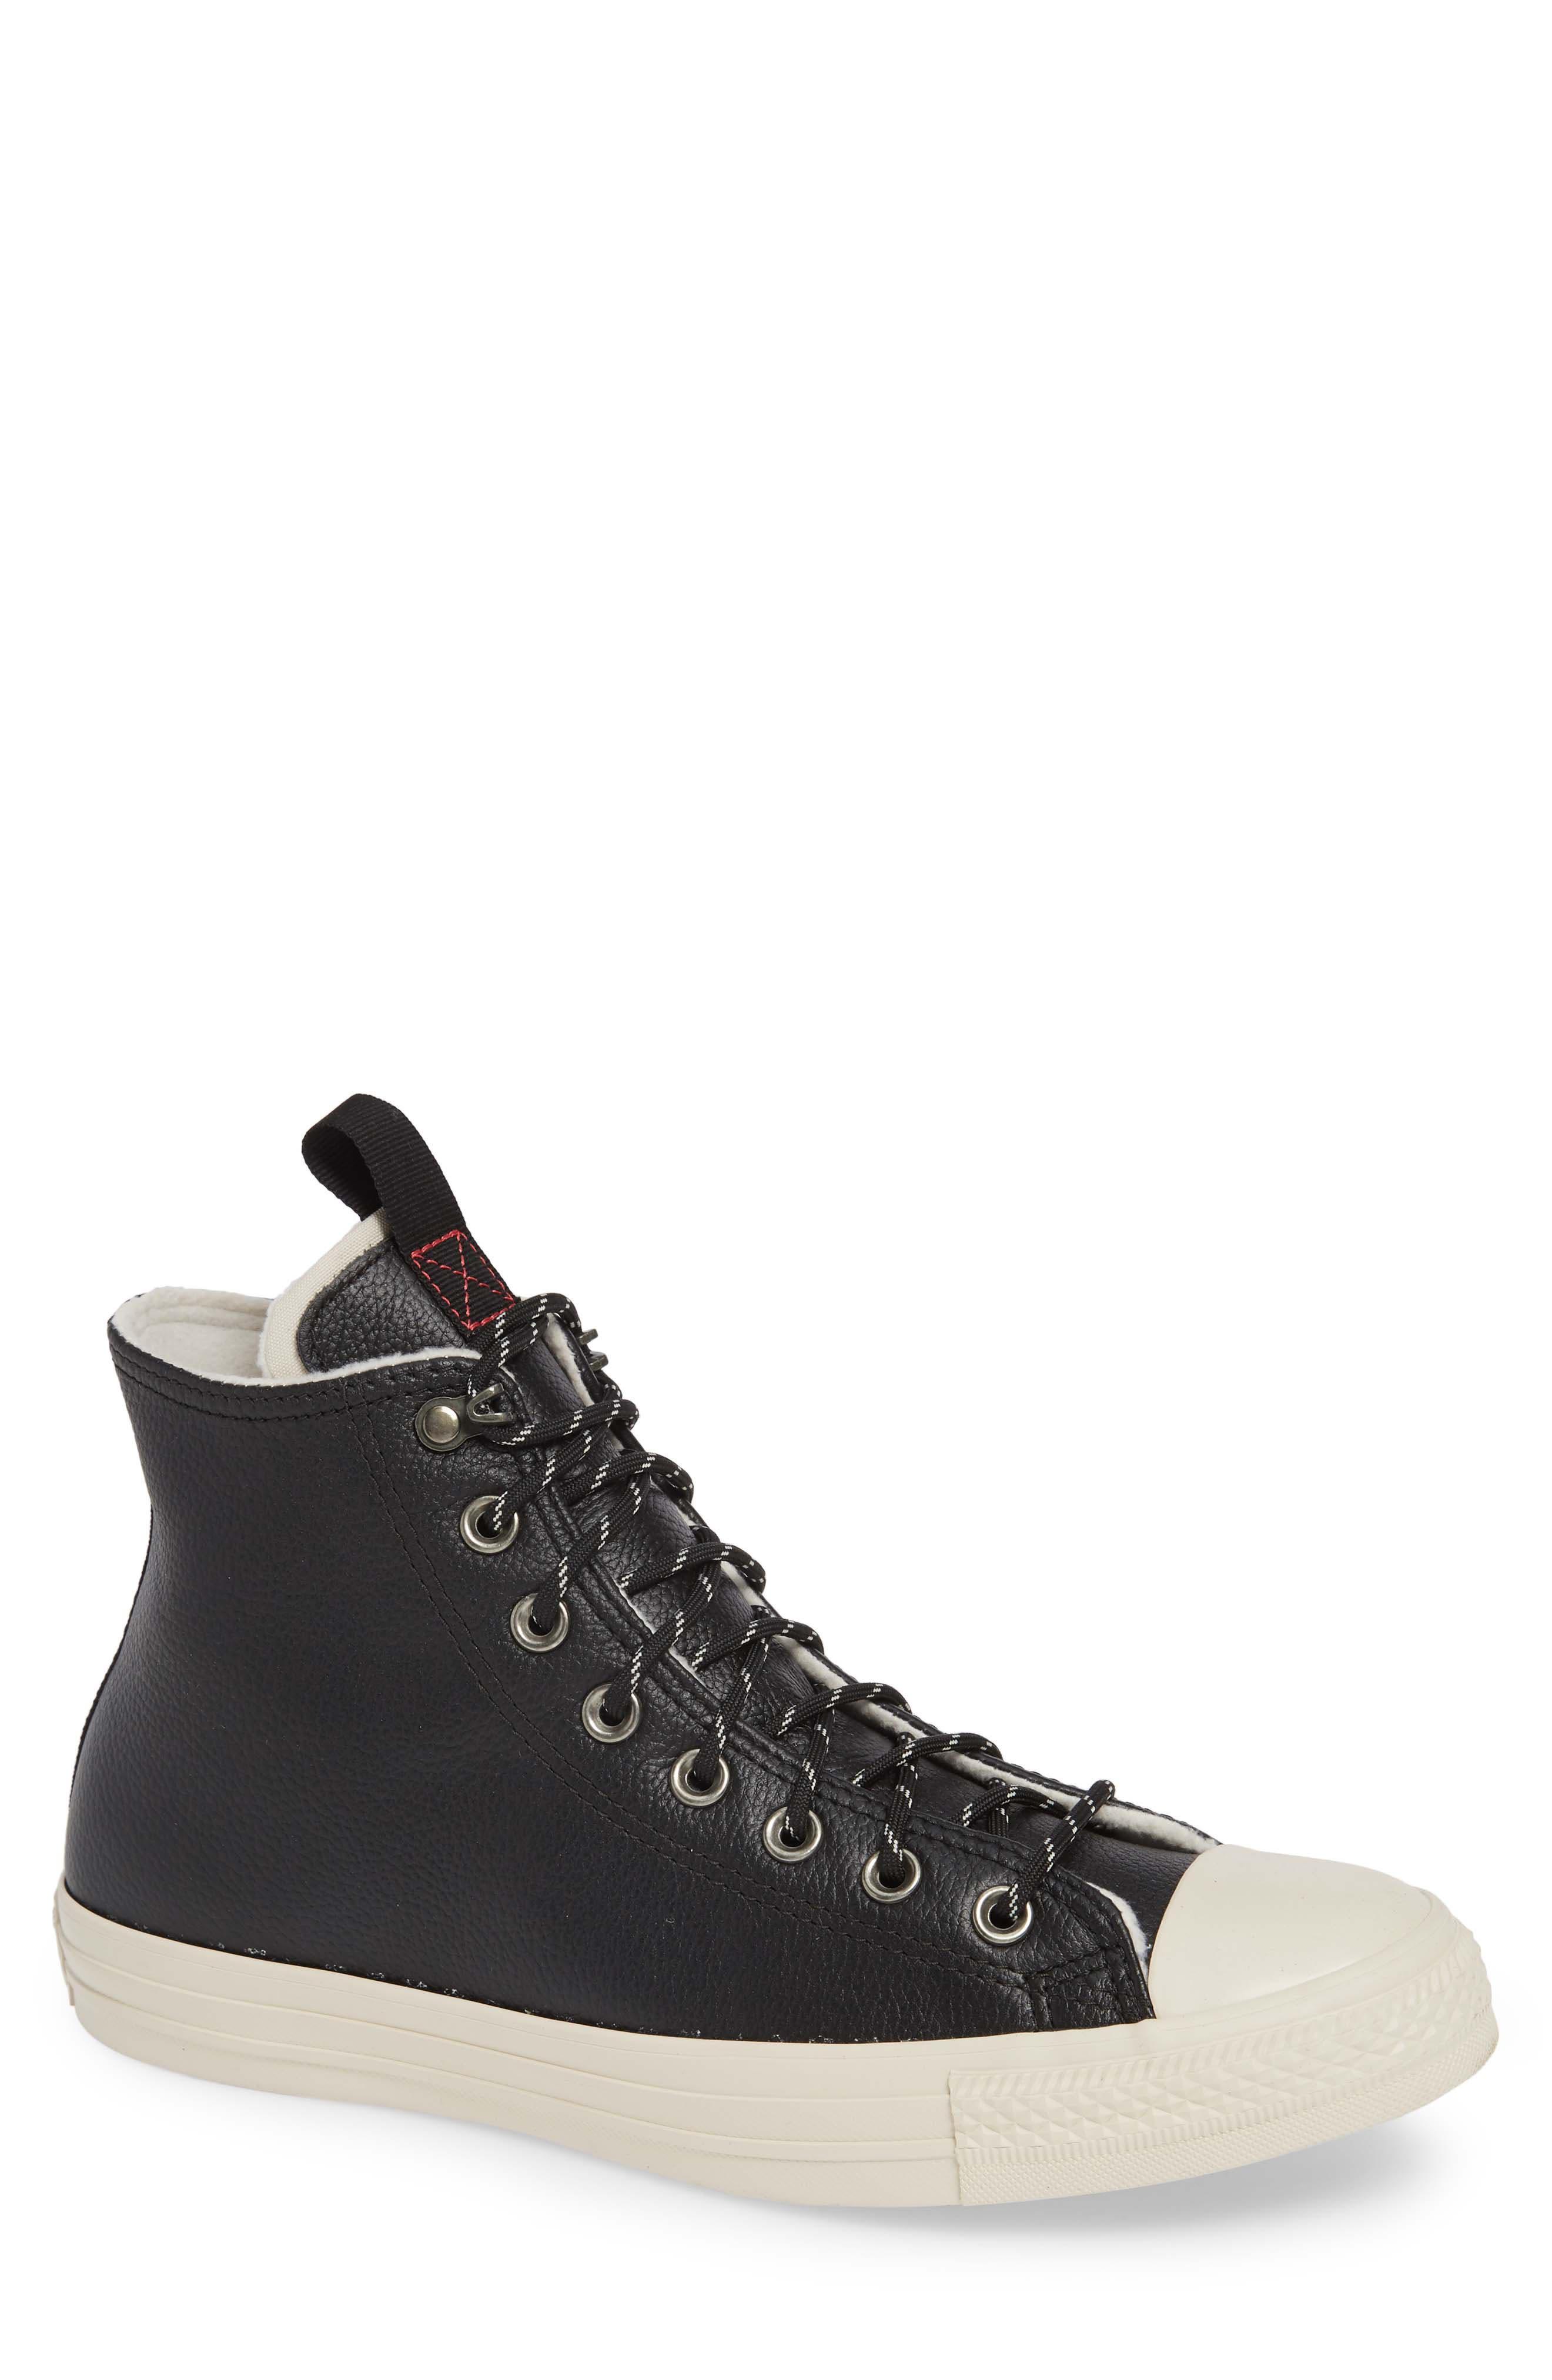 Chuck Taylor<sup>®</sup> All Star<sup>®</sup> Desert Storm Hi Sneaker,                             Main thumbnail 1, color,                             MASON/ BLACK/ DRIFTWOOD